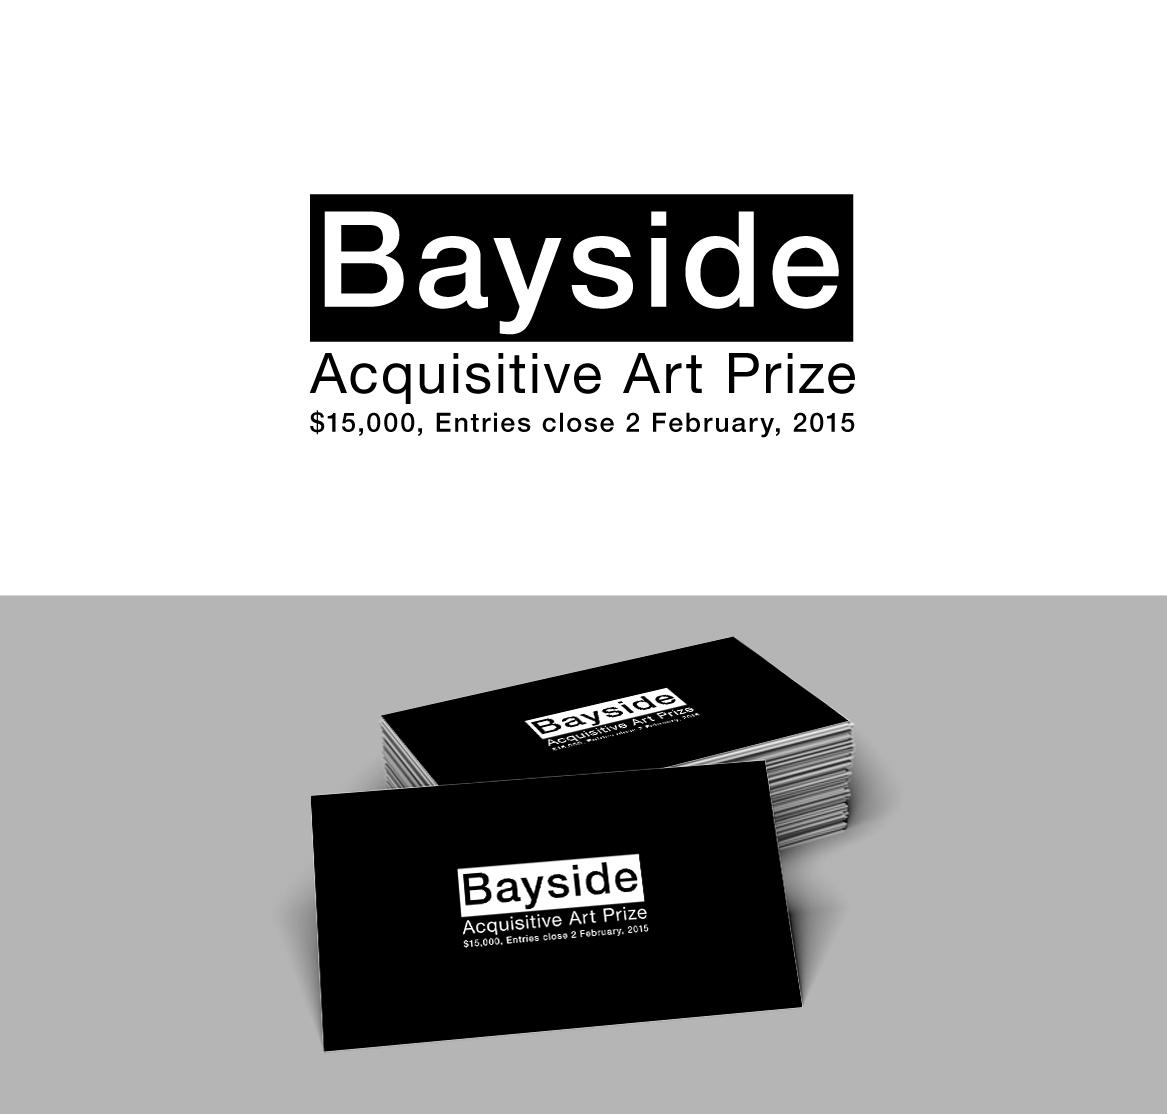 Work Logo Design for Bayside Acquisitive Art Prize, $15,000